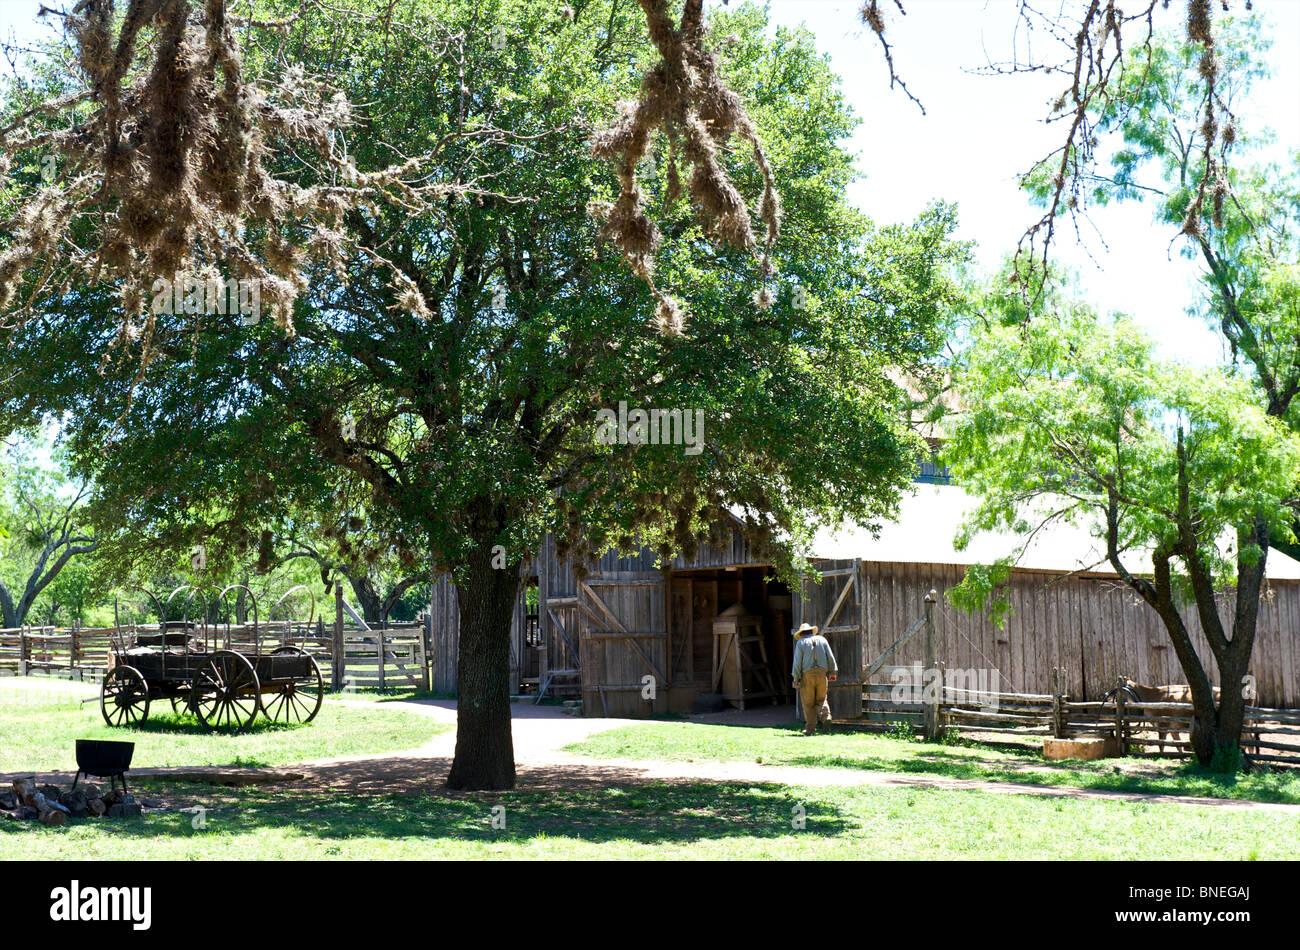 Sauer Becker Farm of the LBJ historic park and ranch Johnson City, Texas, USA - Stock Image